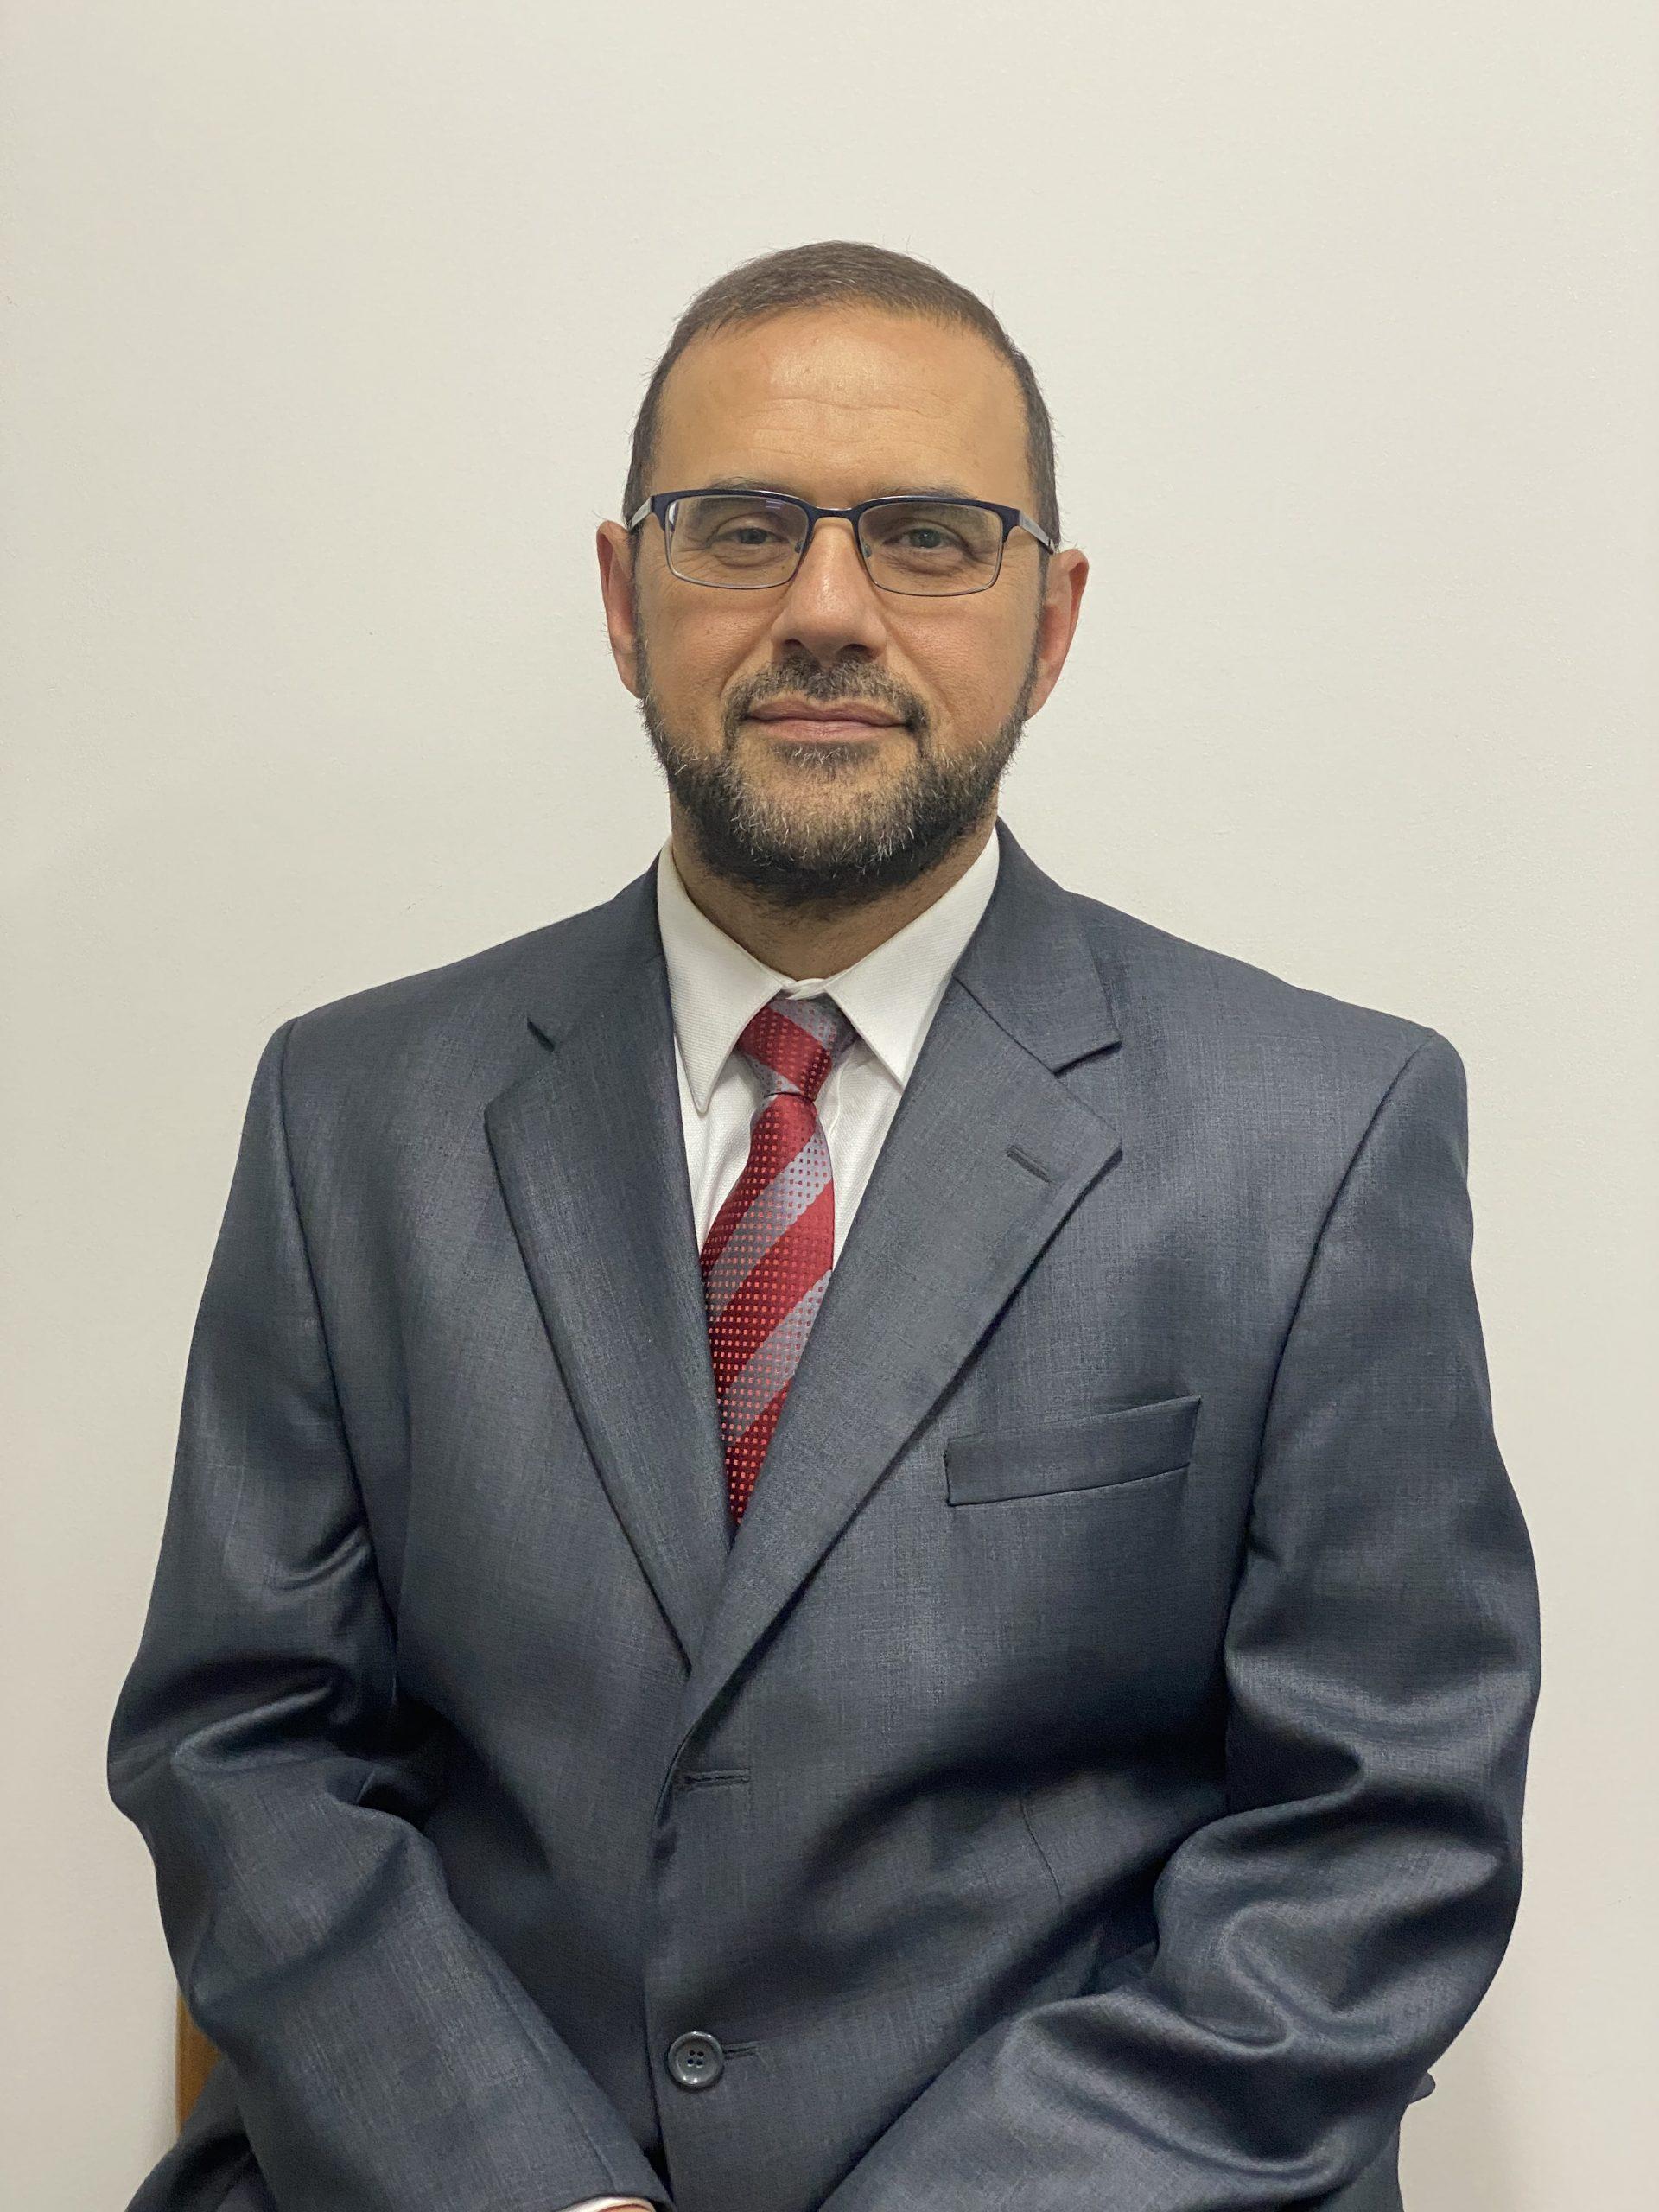 Dr. Abdul-razaq Musa